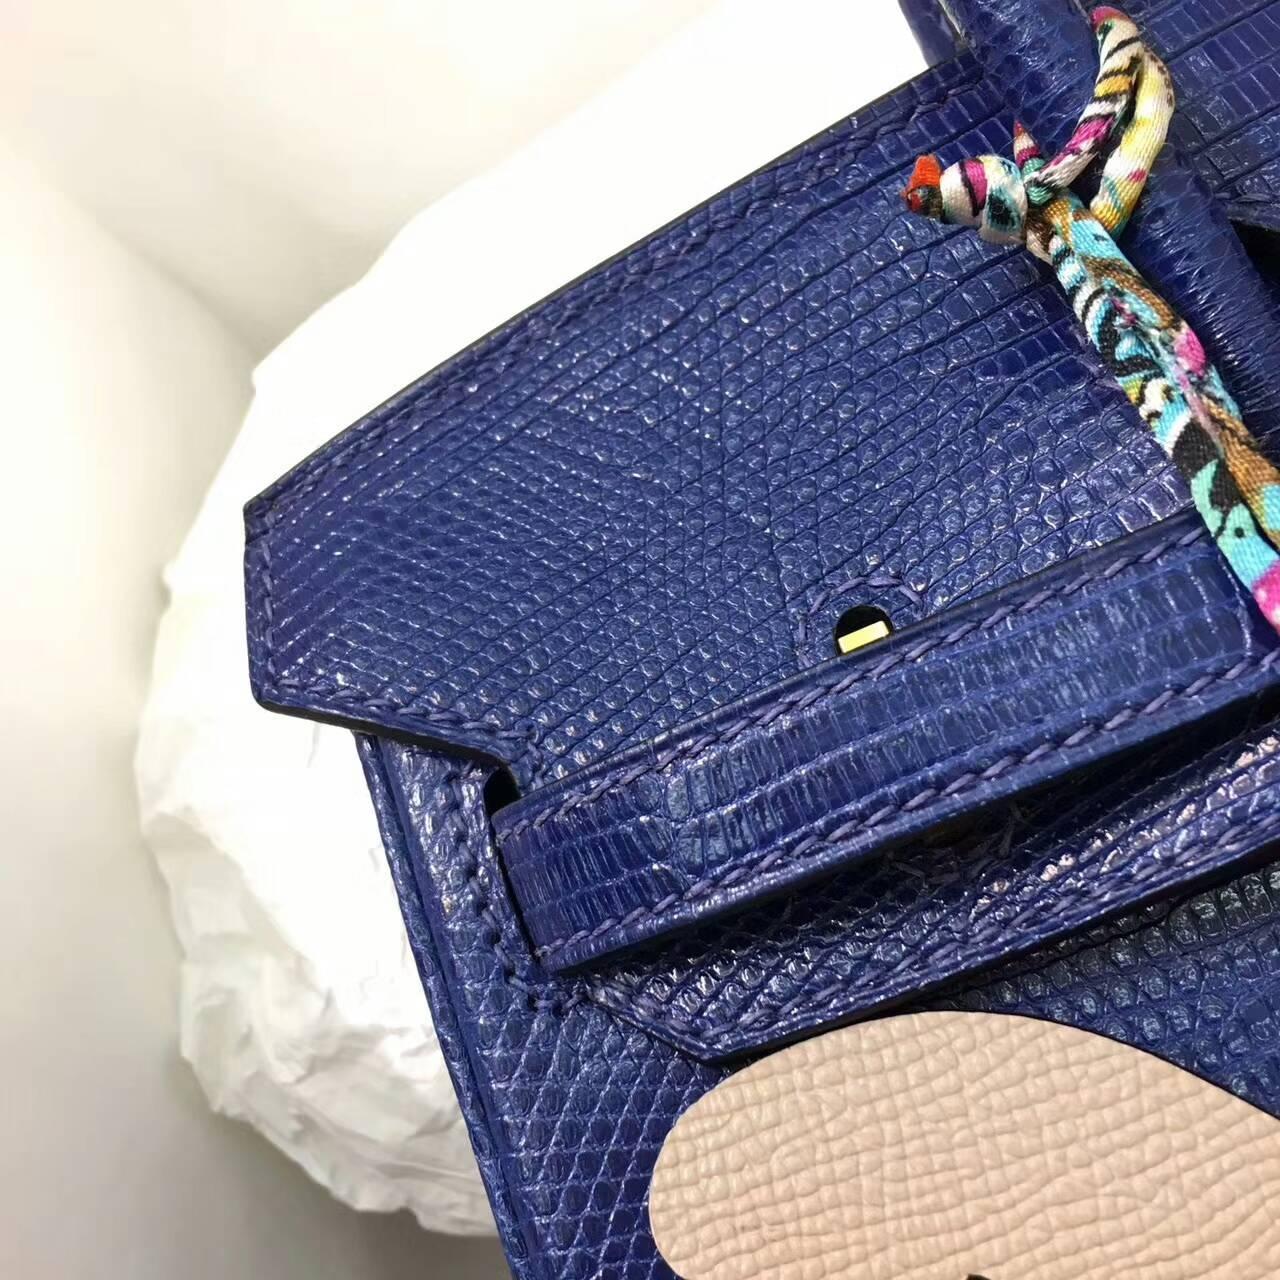 Birkin铂金包 Hermes包包 25cm Lizard 东南亚原产蜥蜴皮 T7 Blue Htdra 电光蓝 金扣